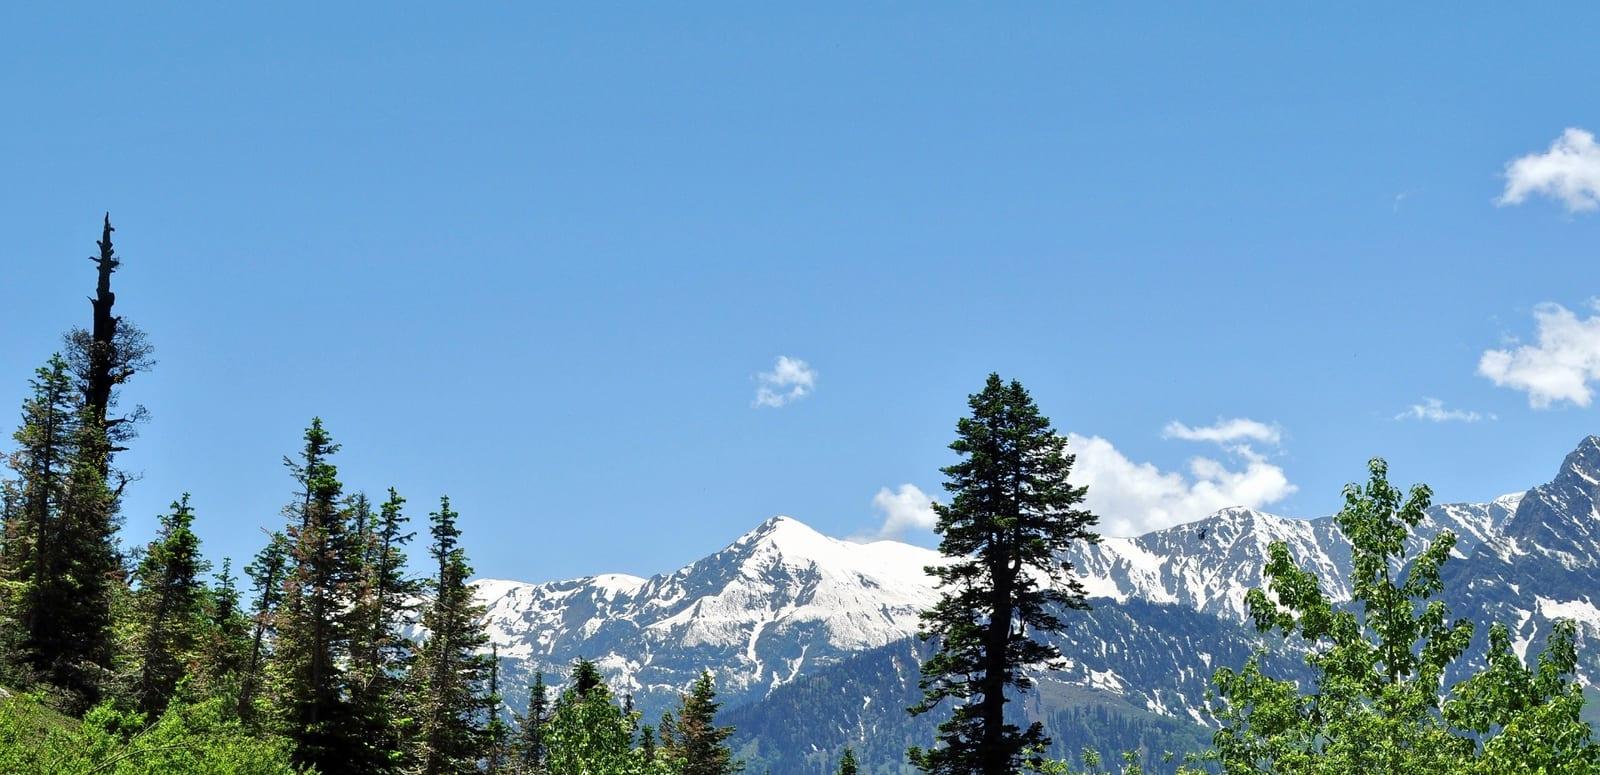 1468233410_massoorie-mountains01.jpg